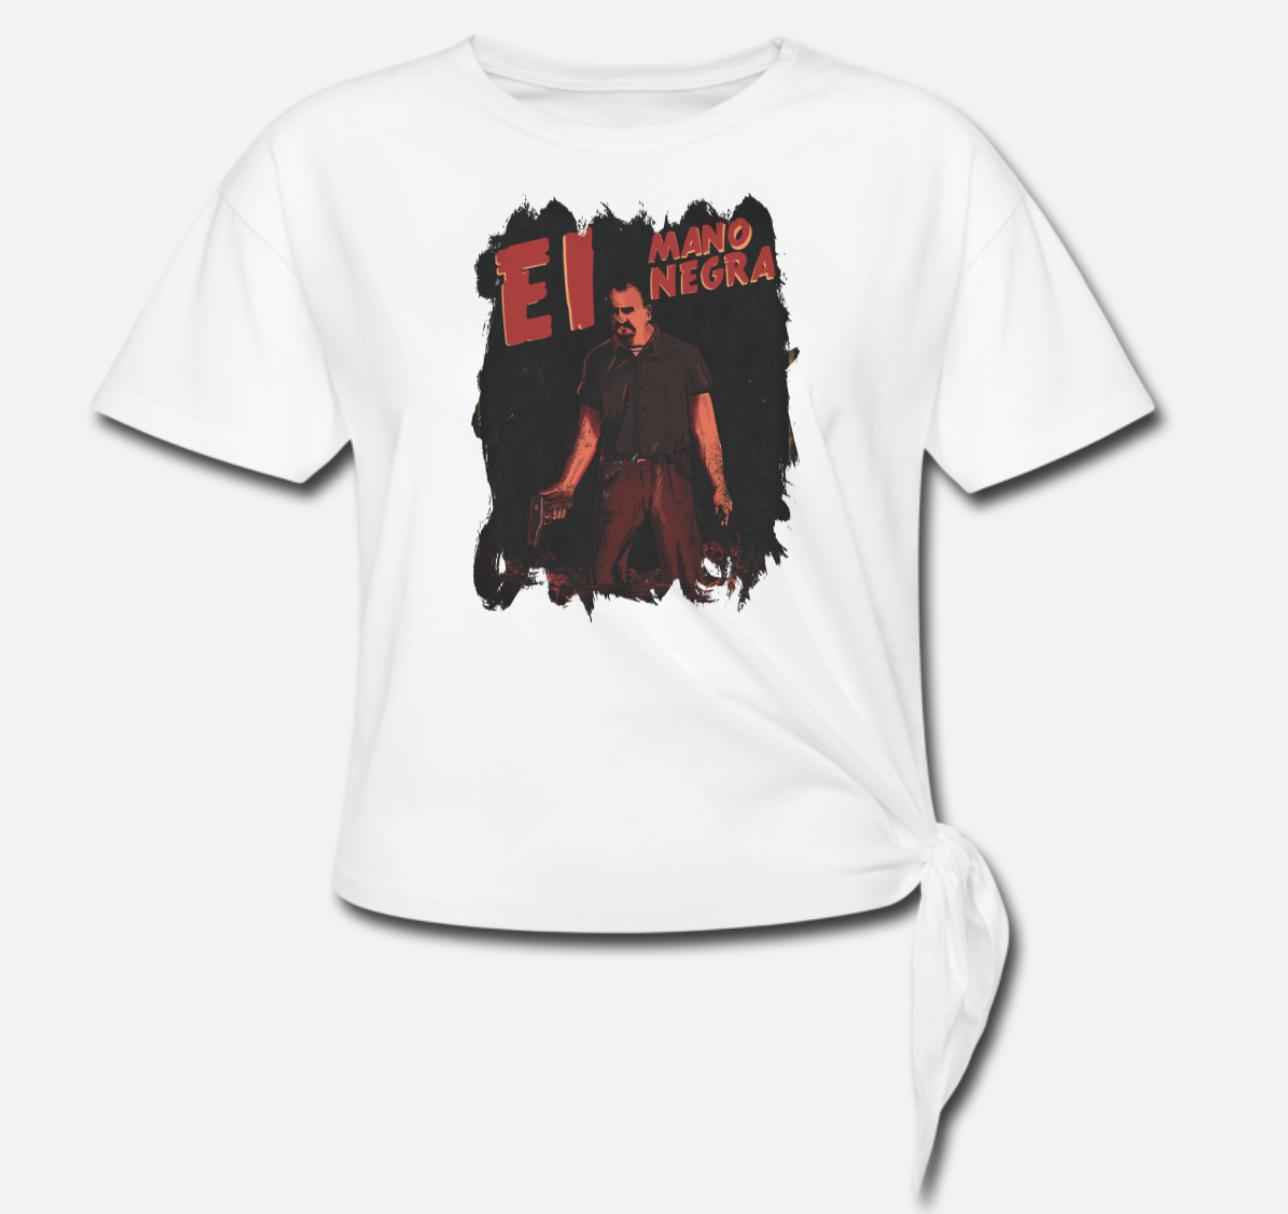 Mano Negra Women's Tie-Off Shirt